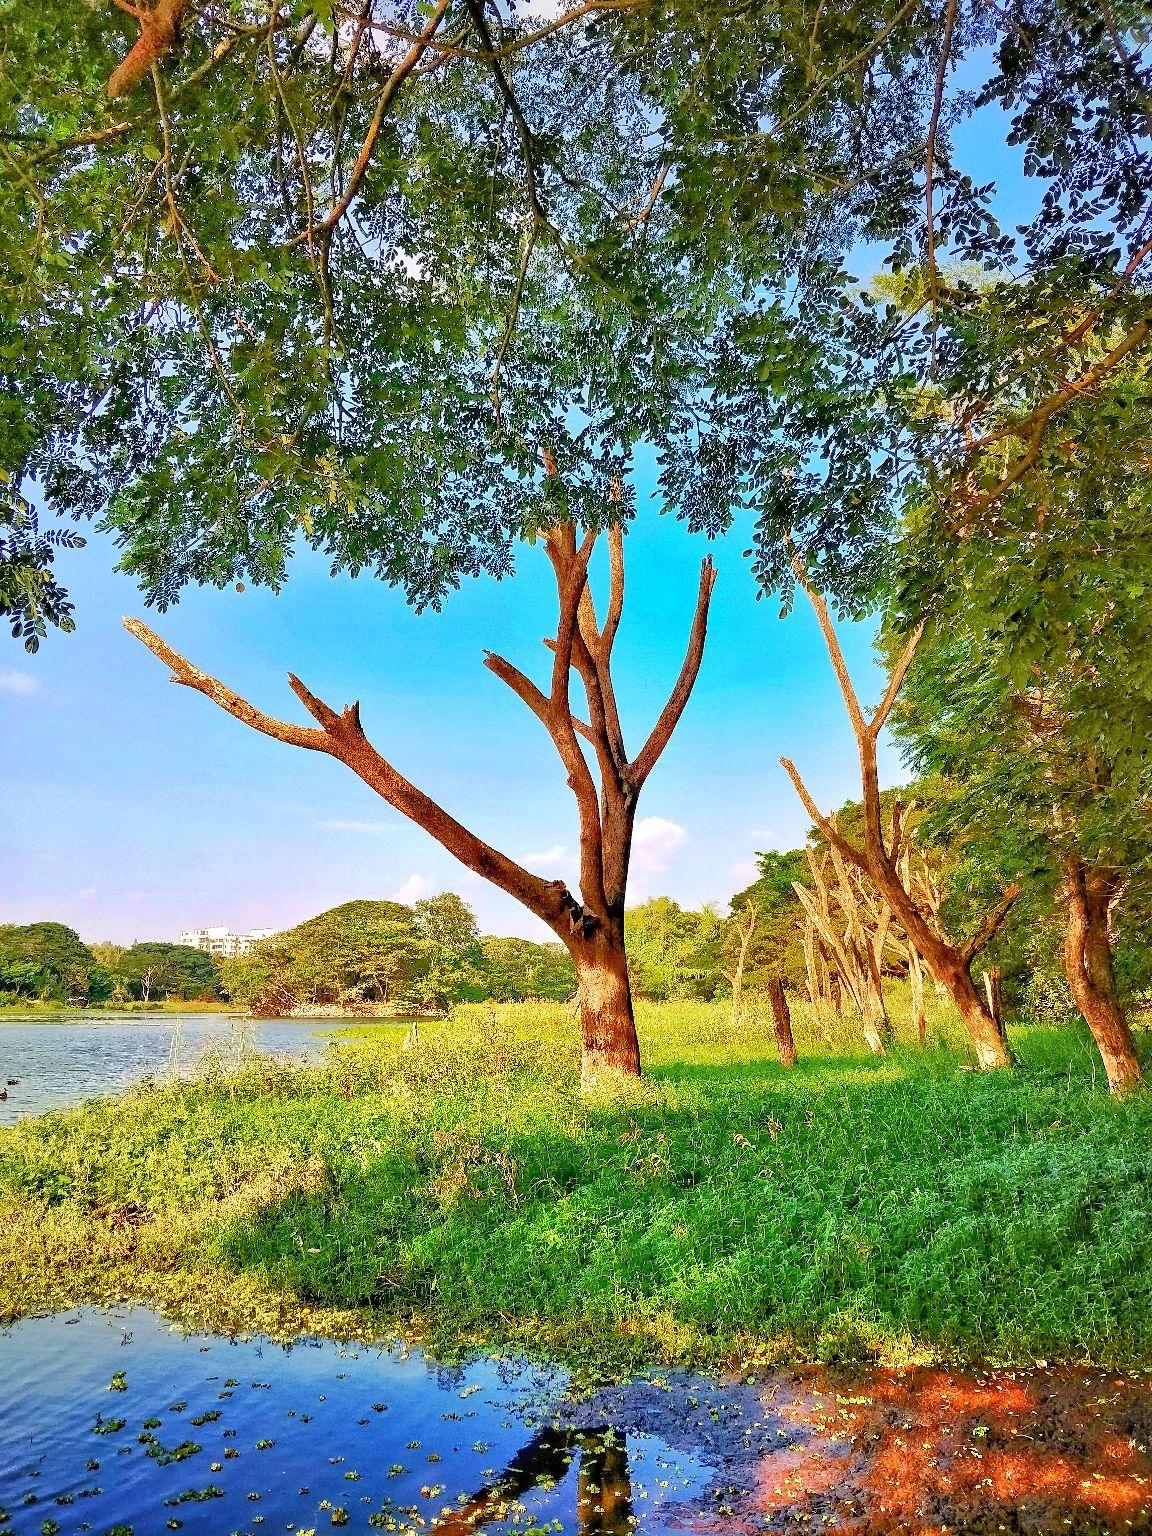 Photo of Wayanad By Saurabh Roy